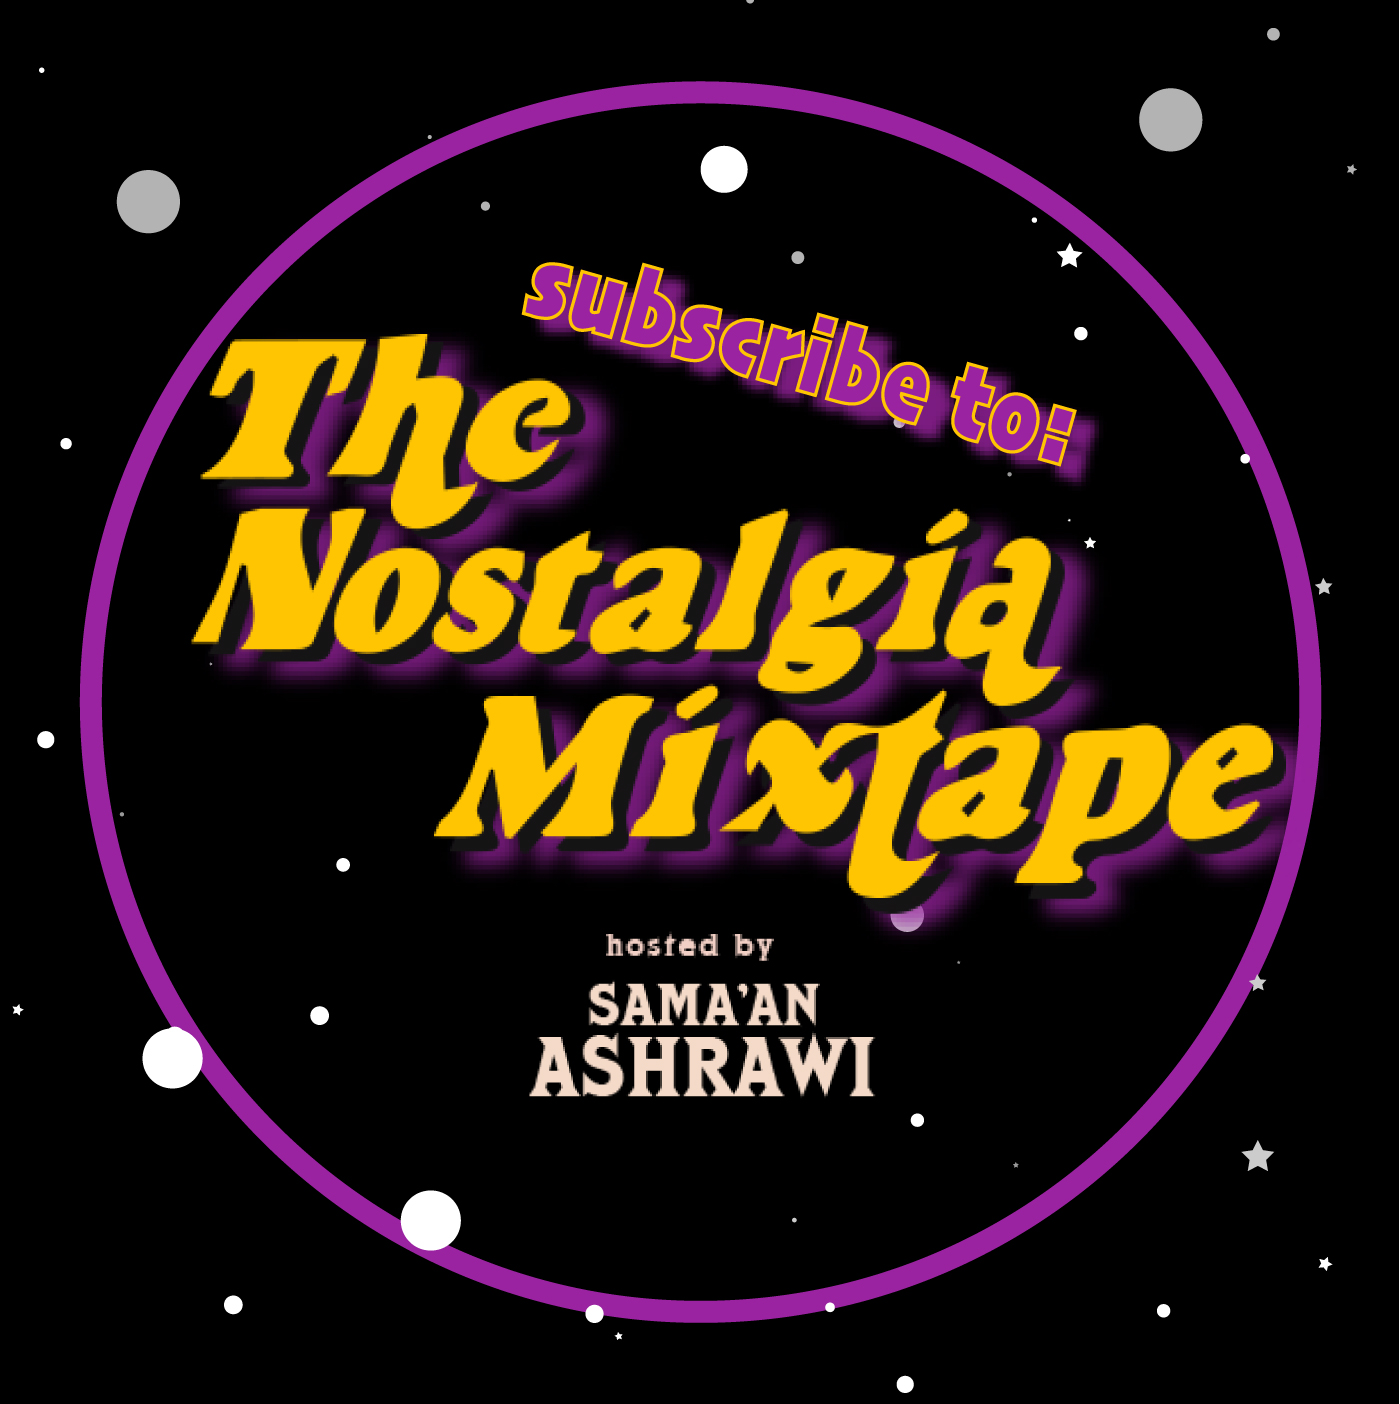 subscribe nostalgia mixtape